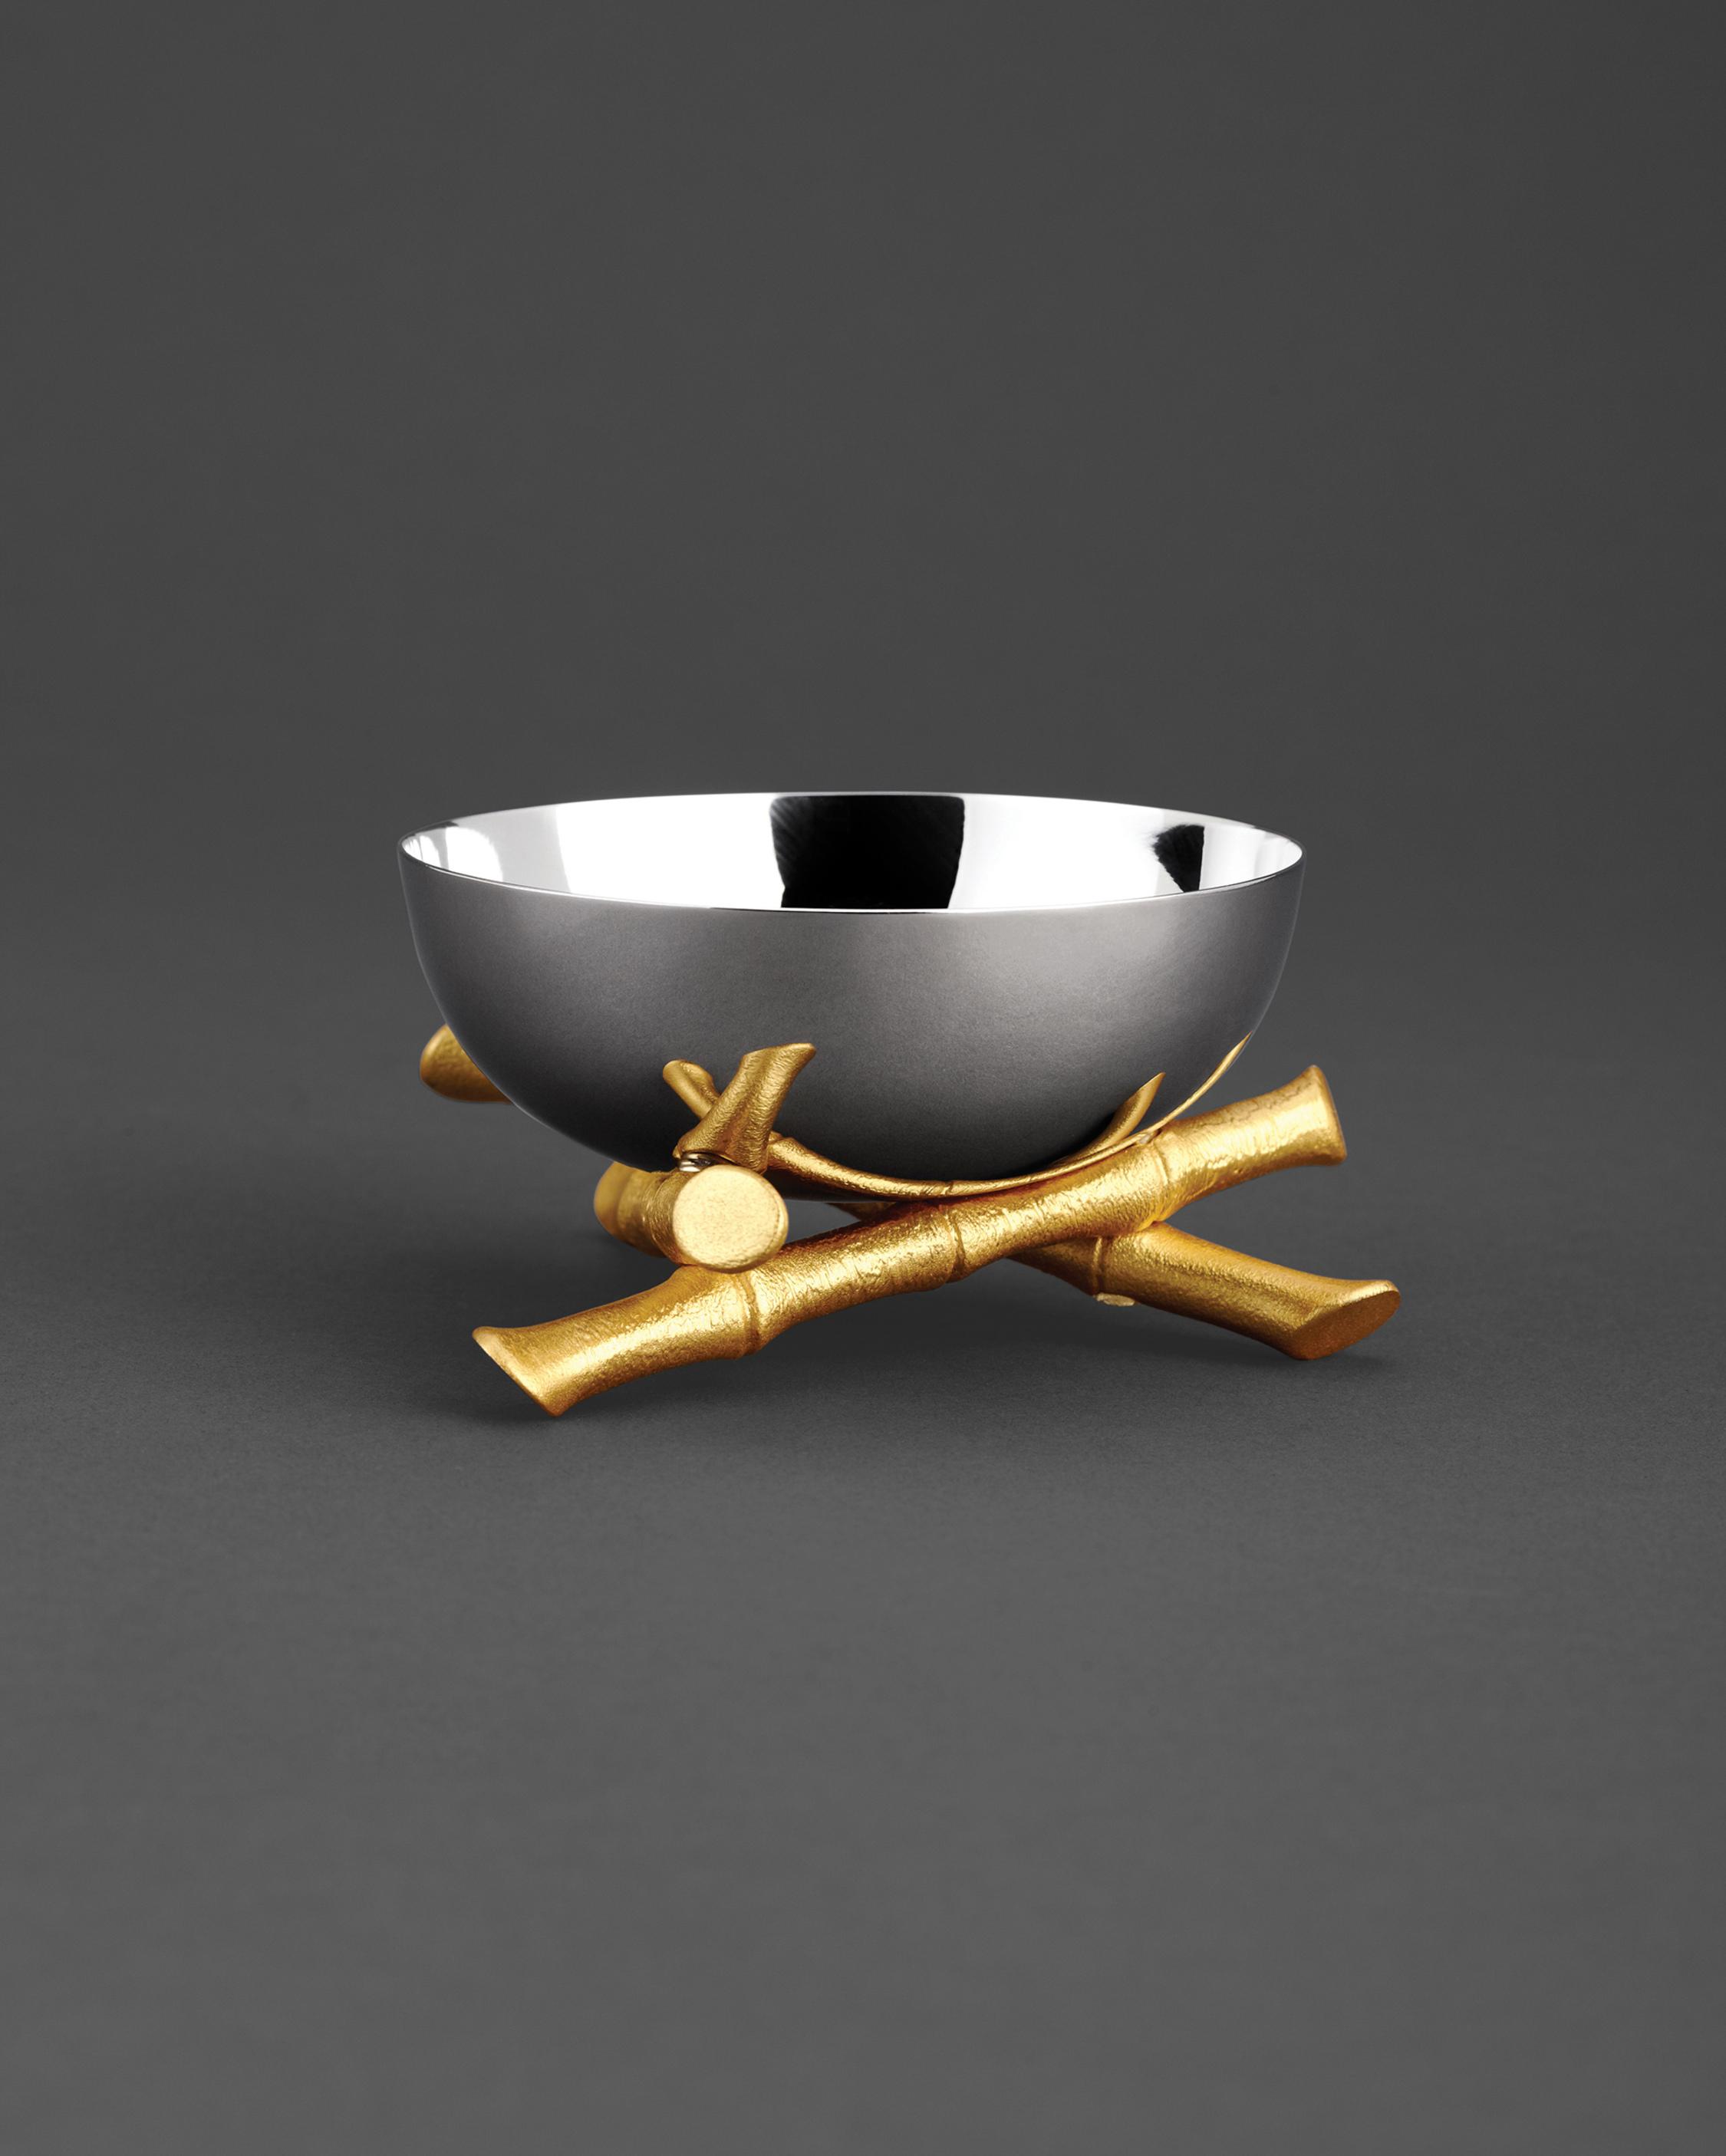 L'Objet Bambou Small Bowl 2